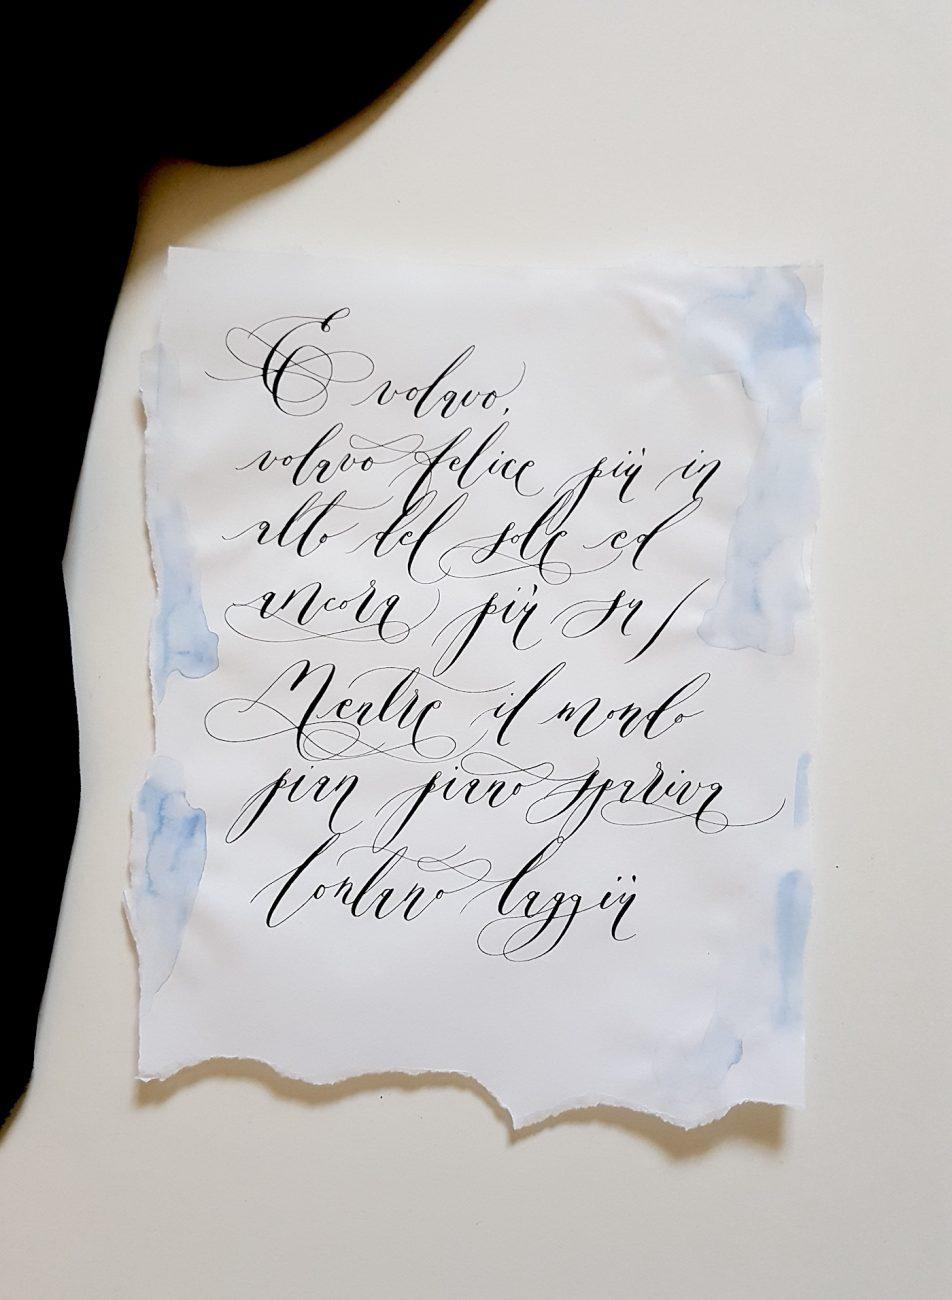 Italian Themed Wedding Invitations - calligraphy poem